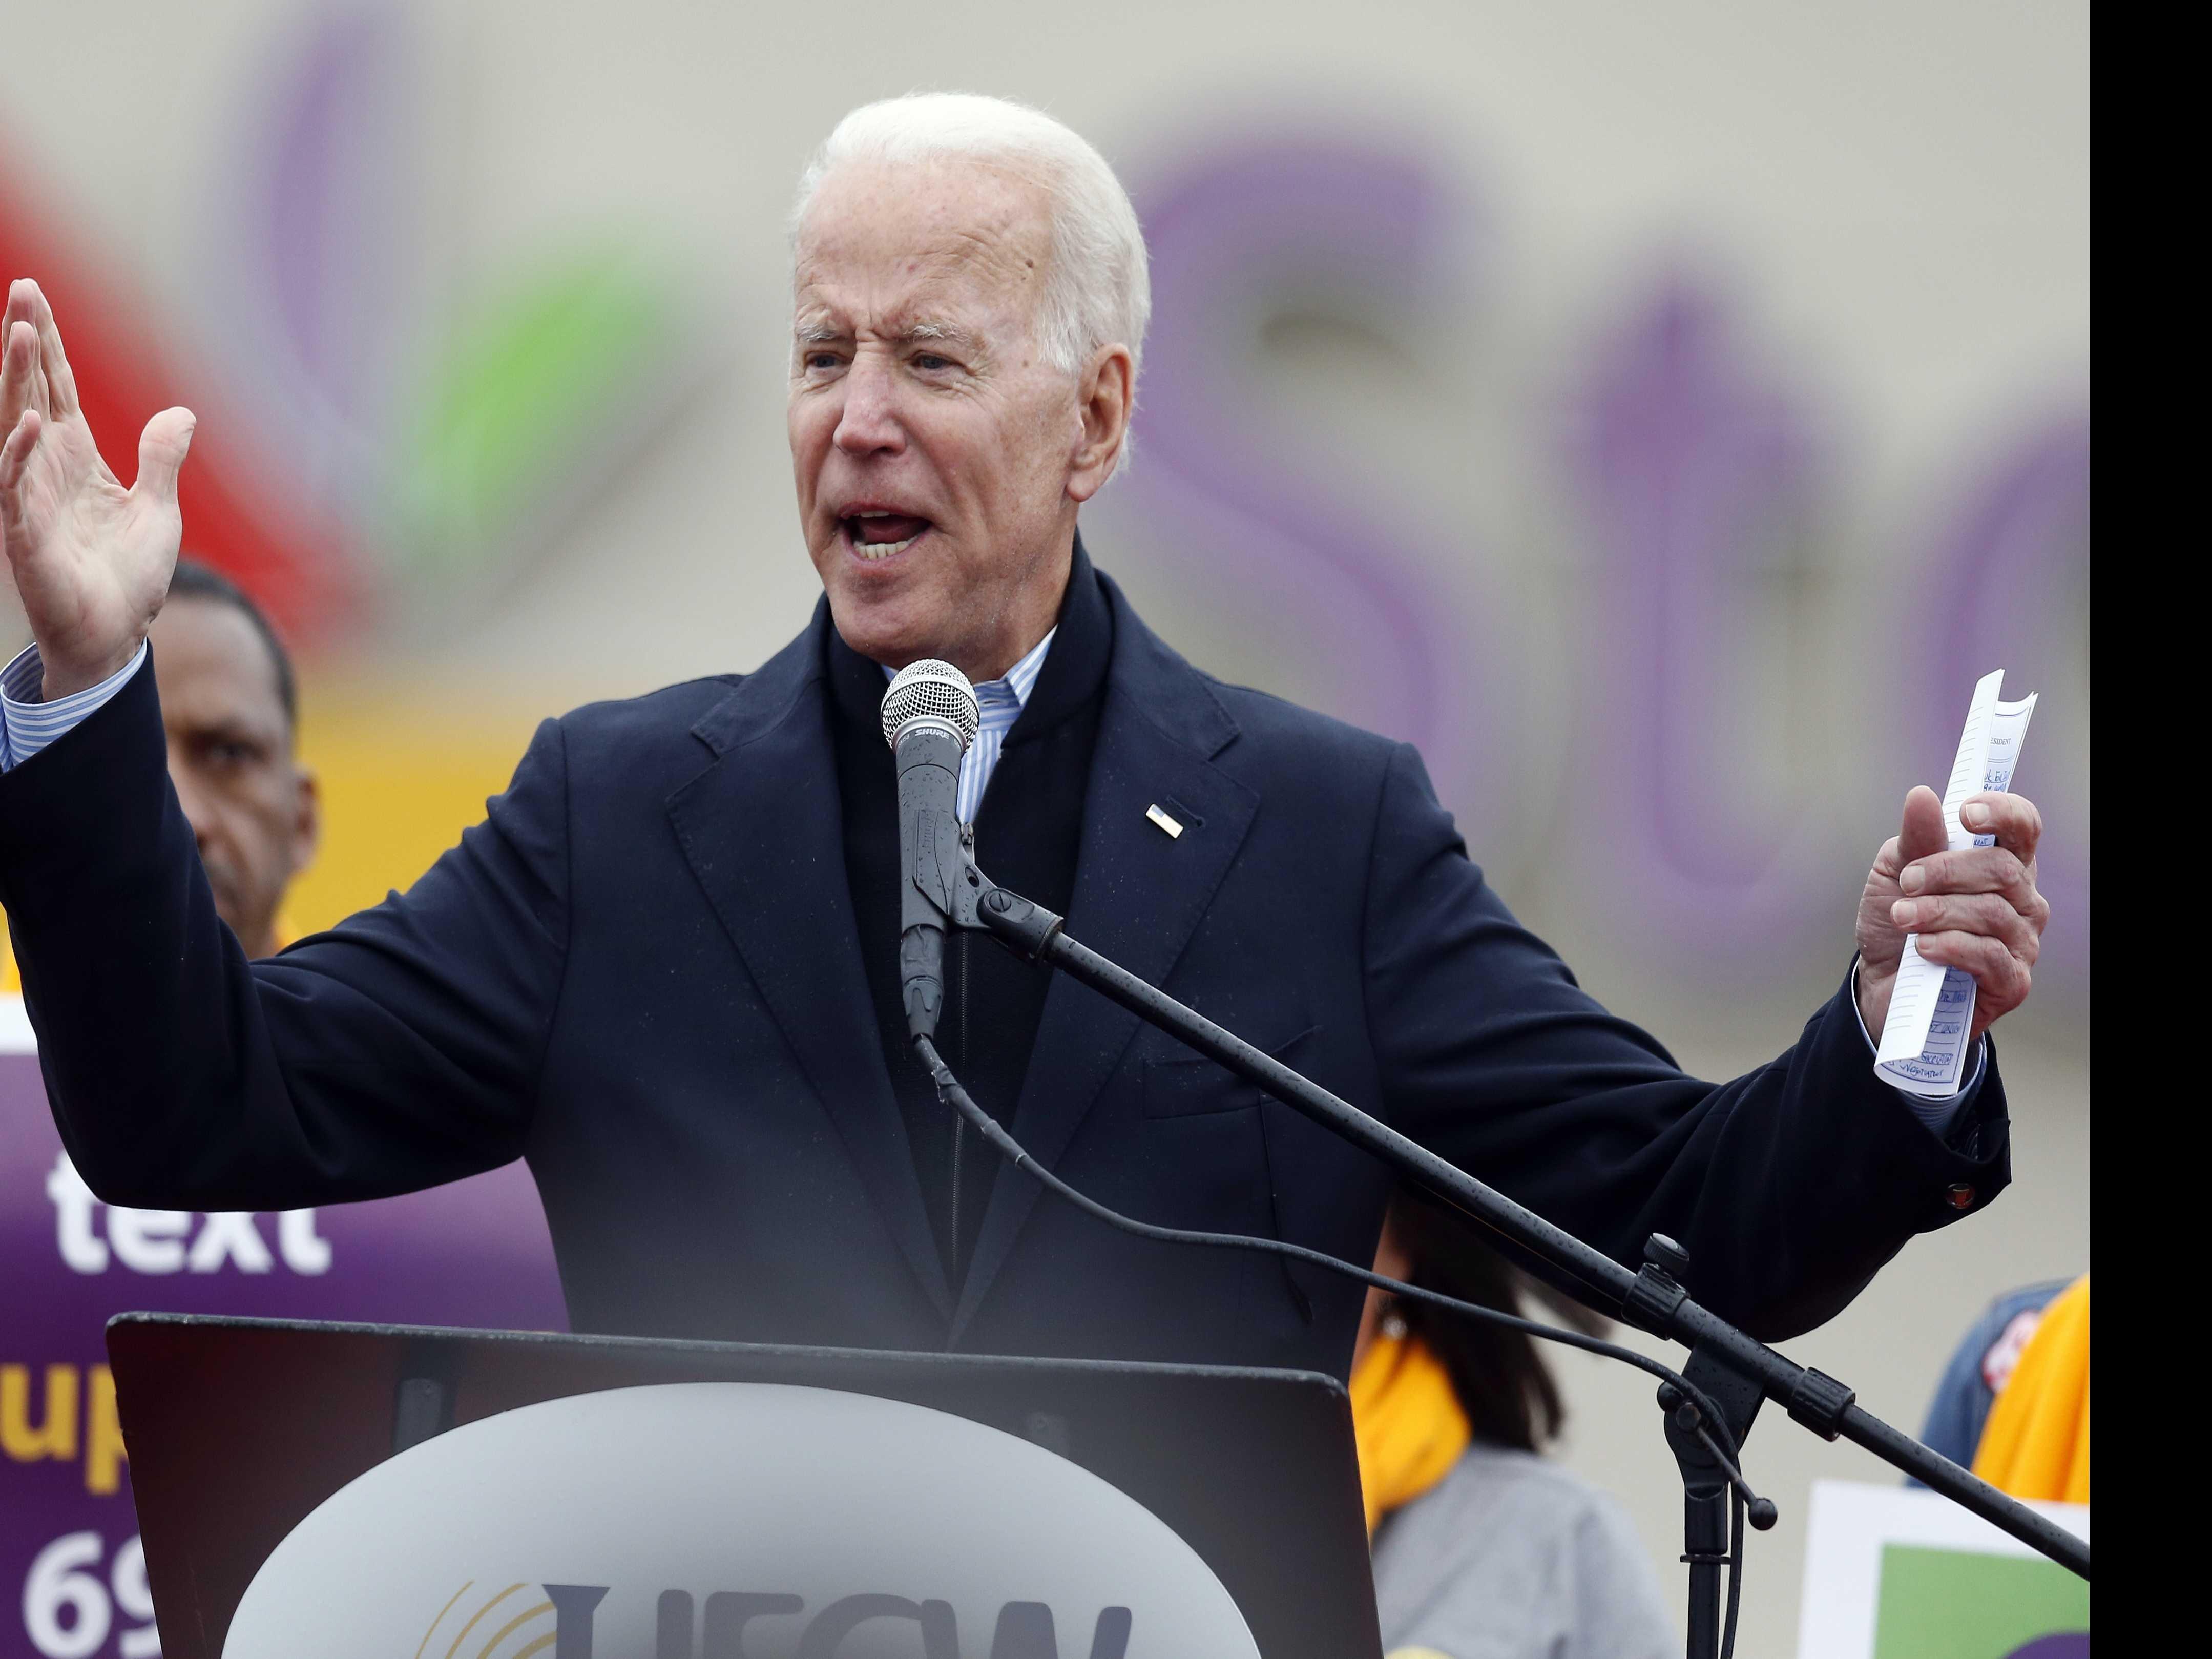 Flores Calls Biden's Jokes About Touching 'Disrespectful'